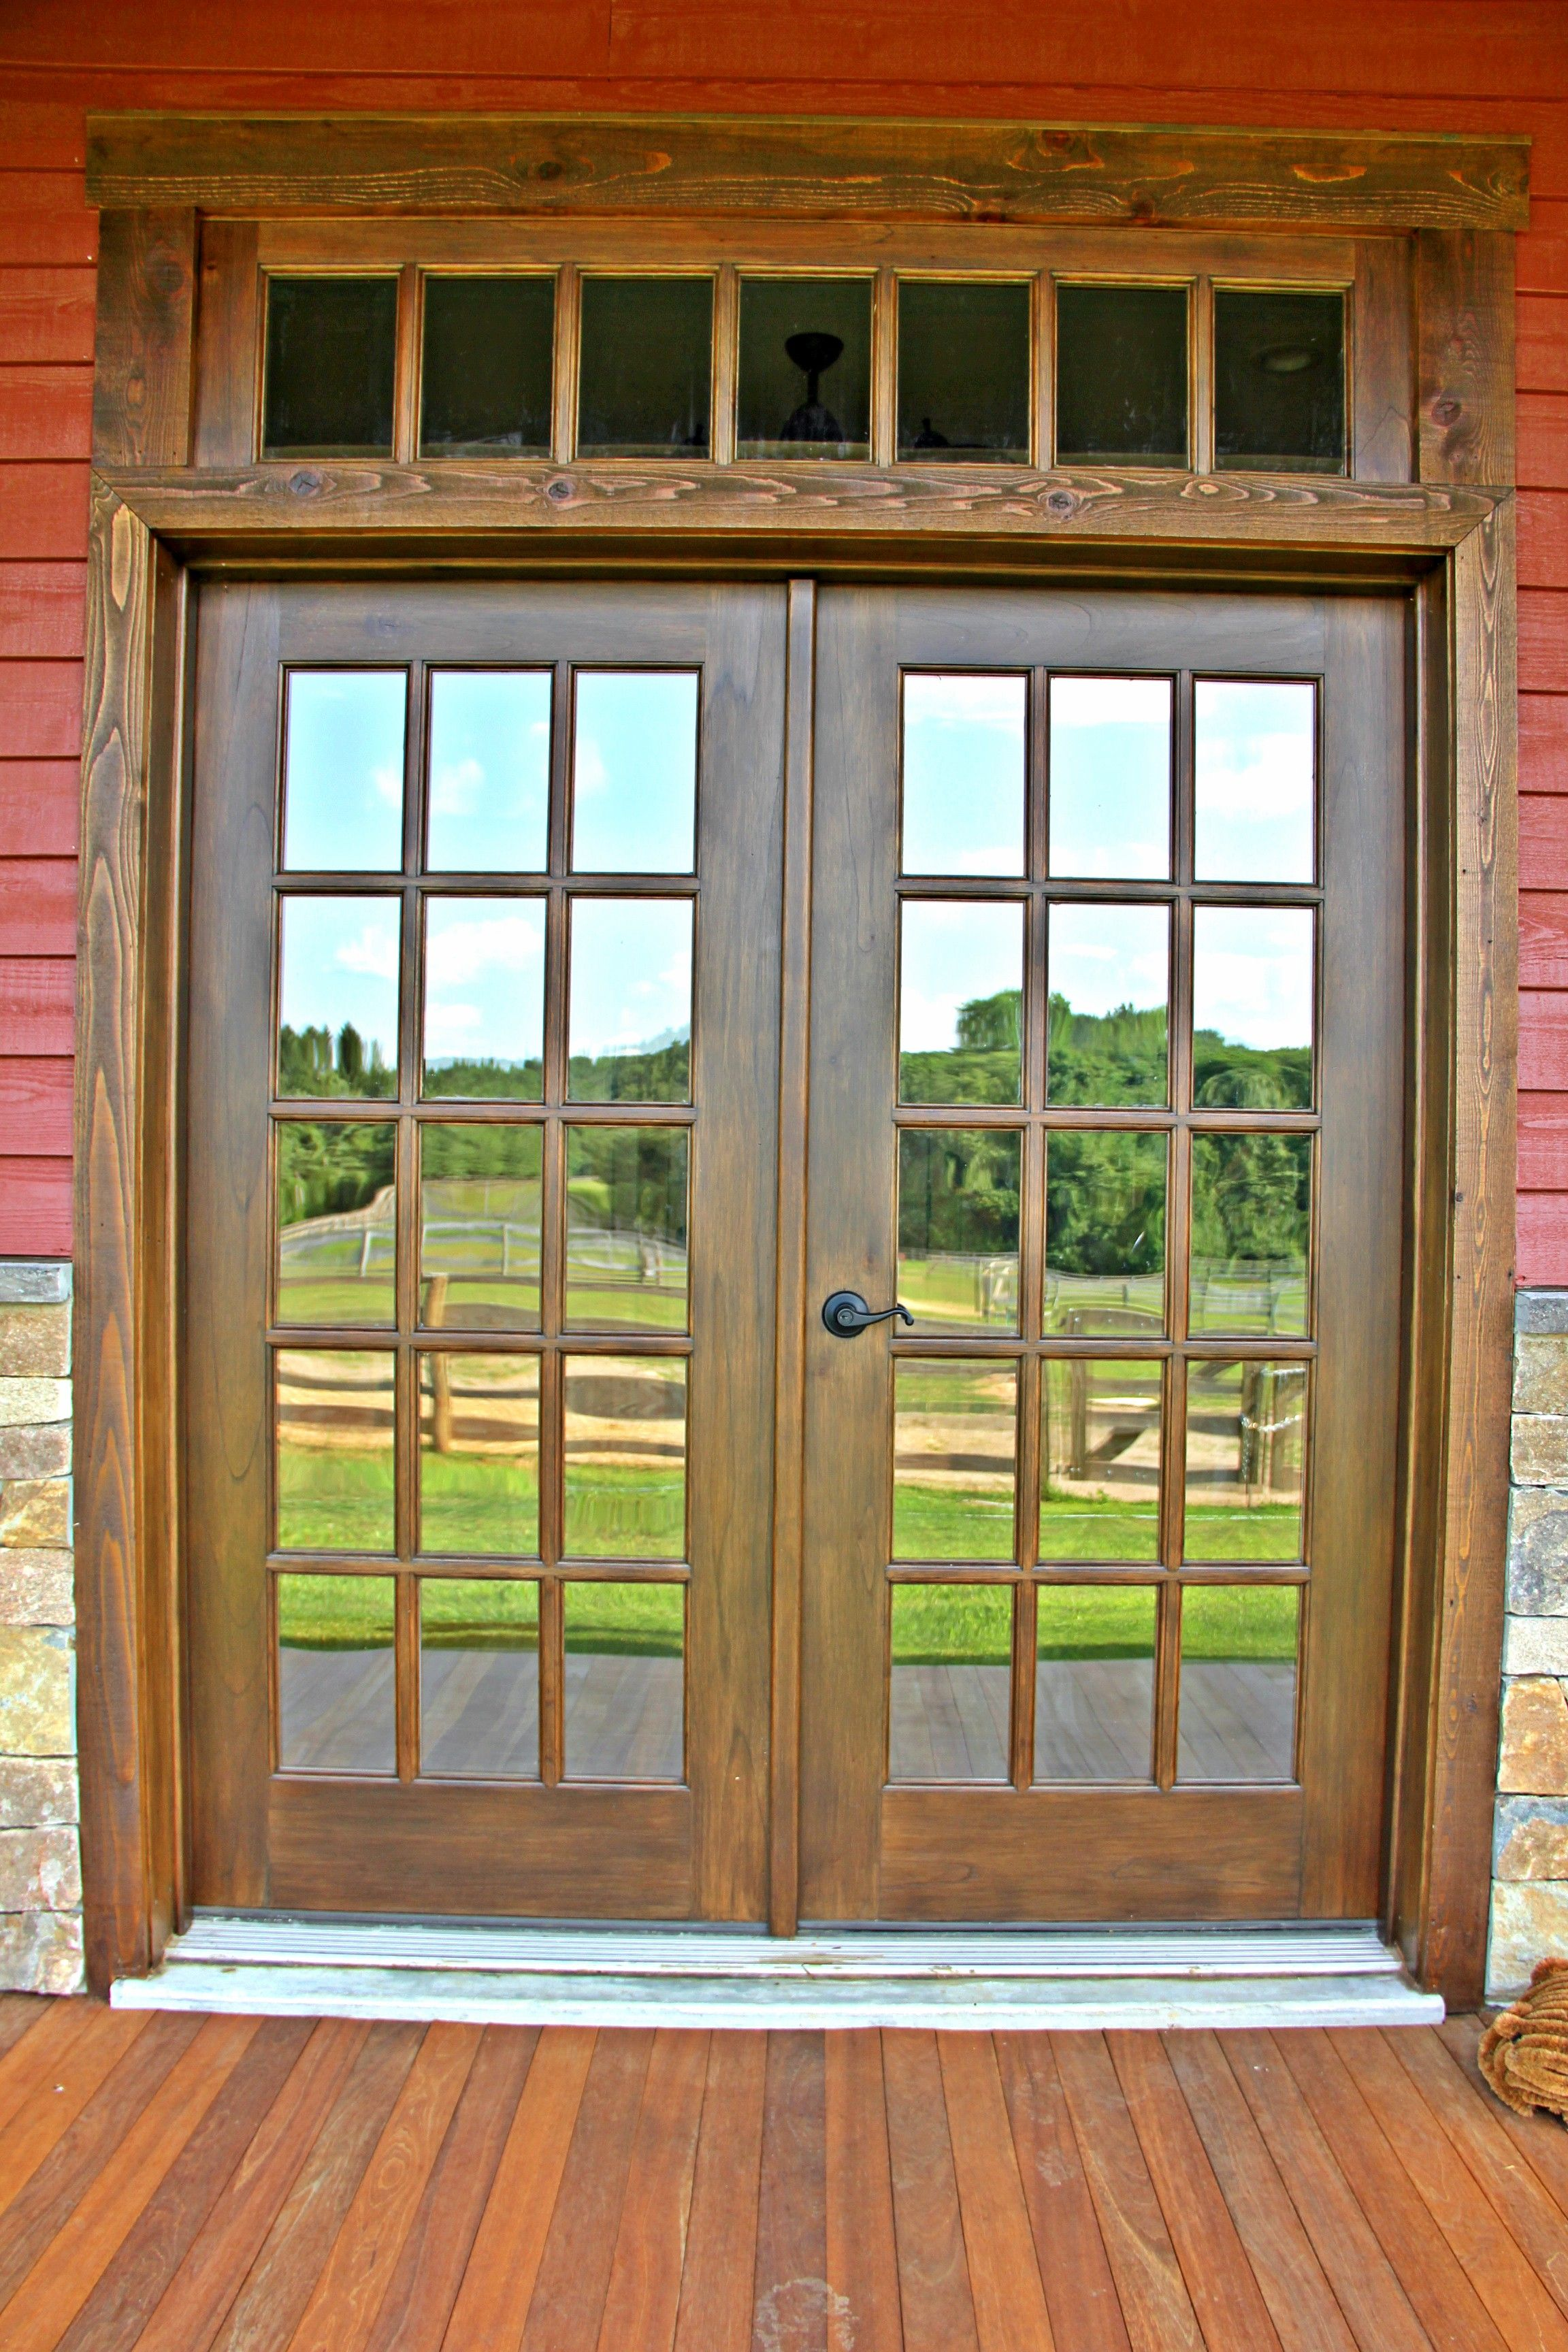 Pin By King Construction Co Llc On Horse Barn Doors Windows Barn Door Window Horse Barn Doors Horse Barn